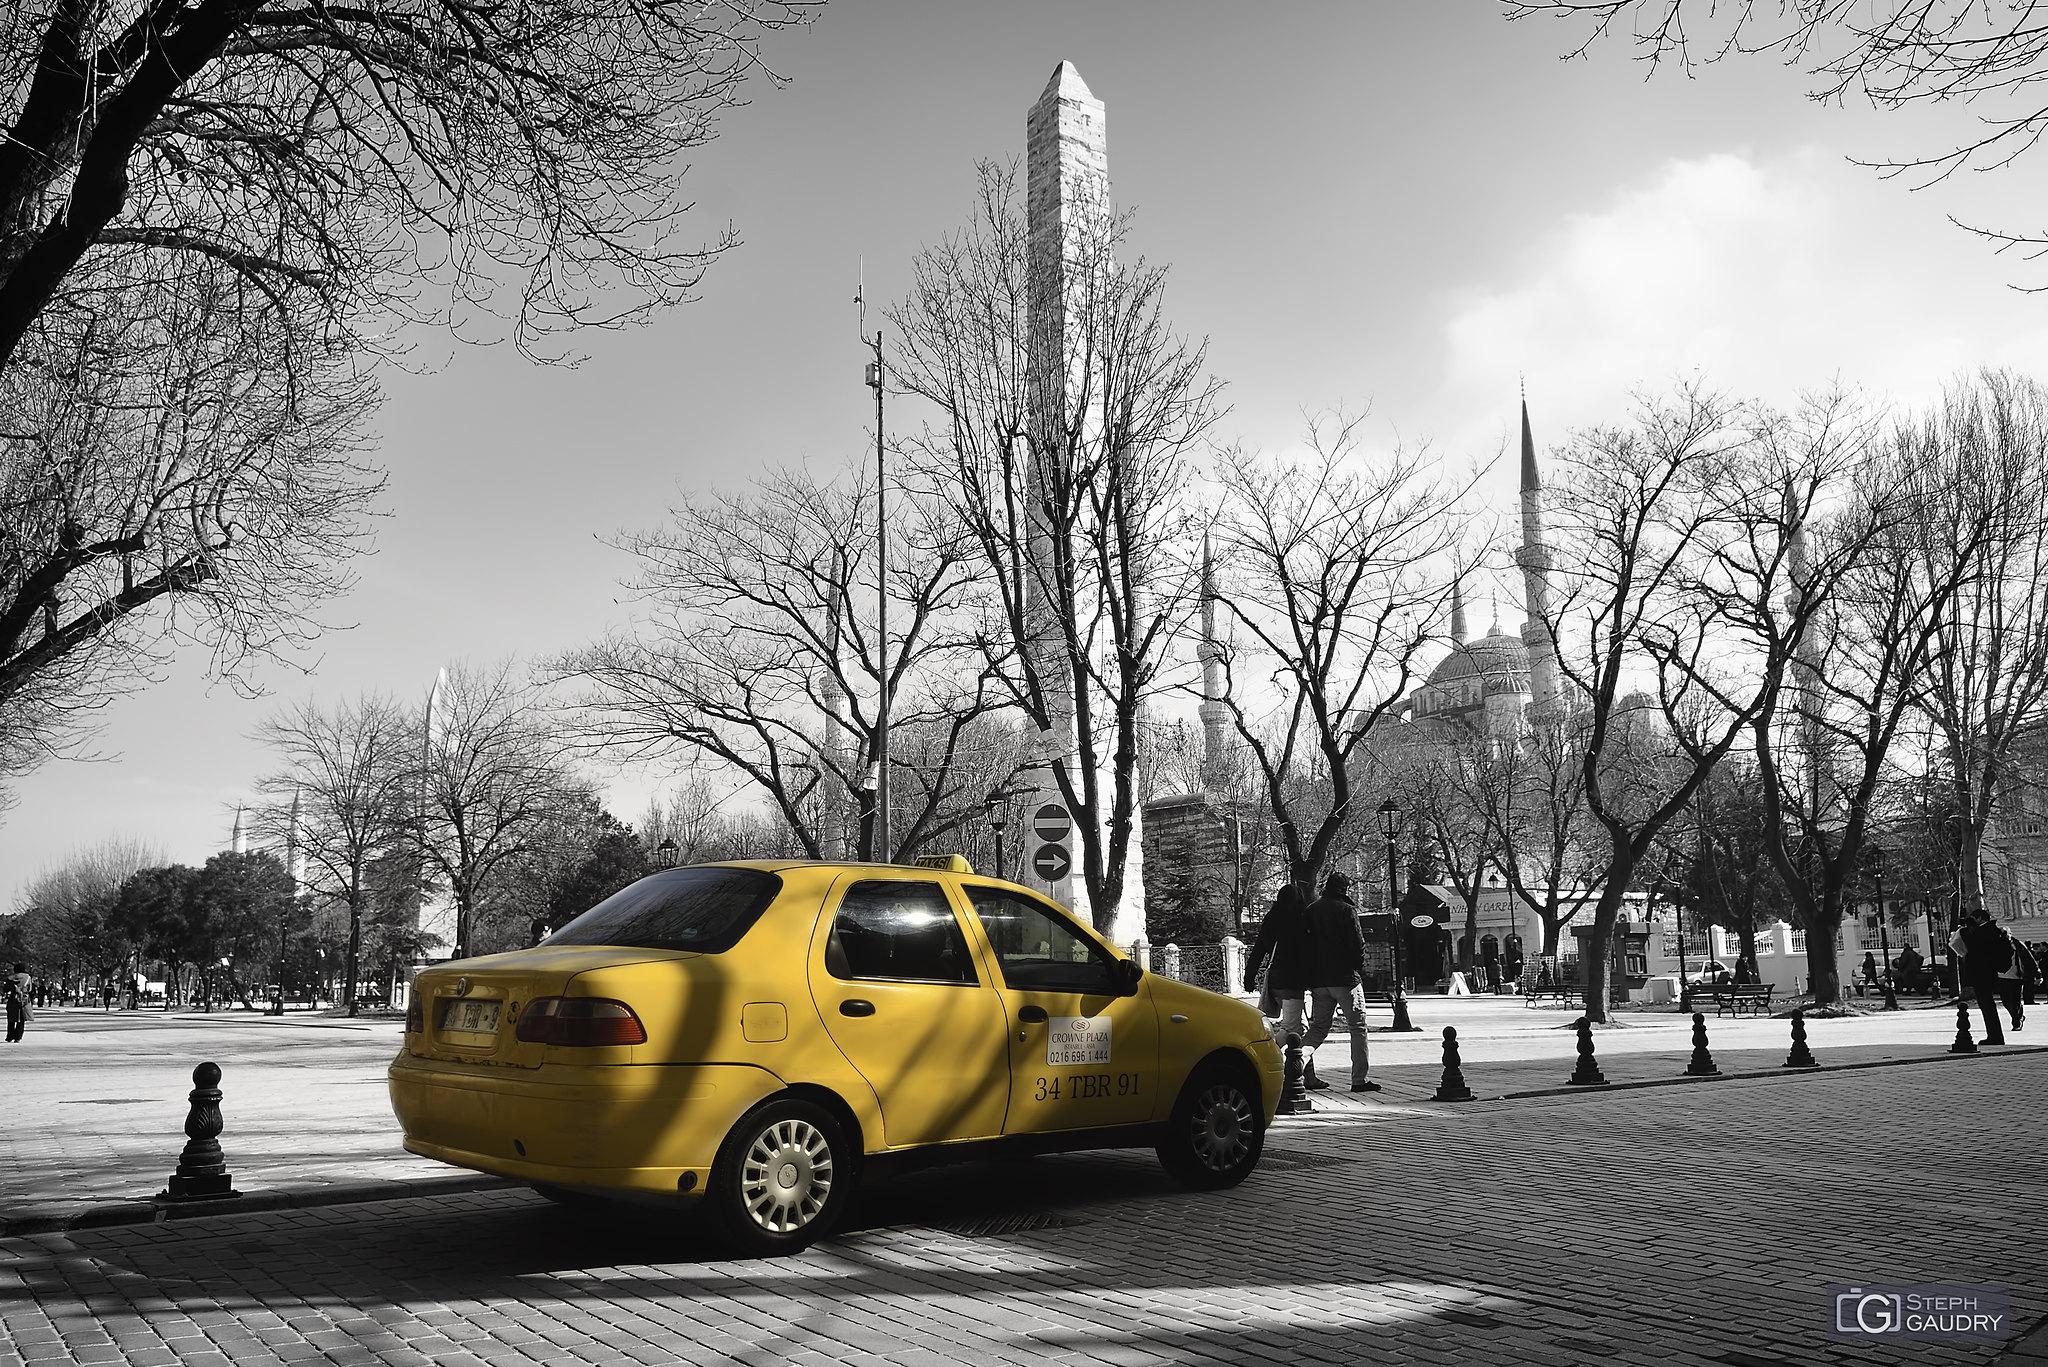 Sultanahmet Camii önünde sarı bir taksi [Click to start slideshow]